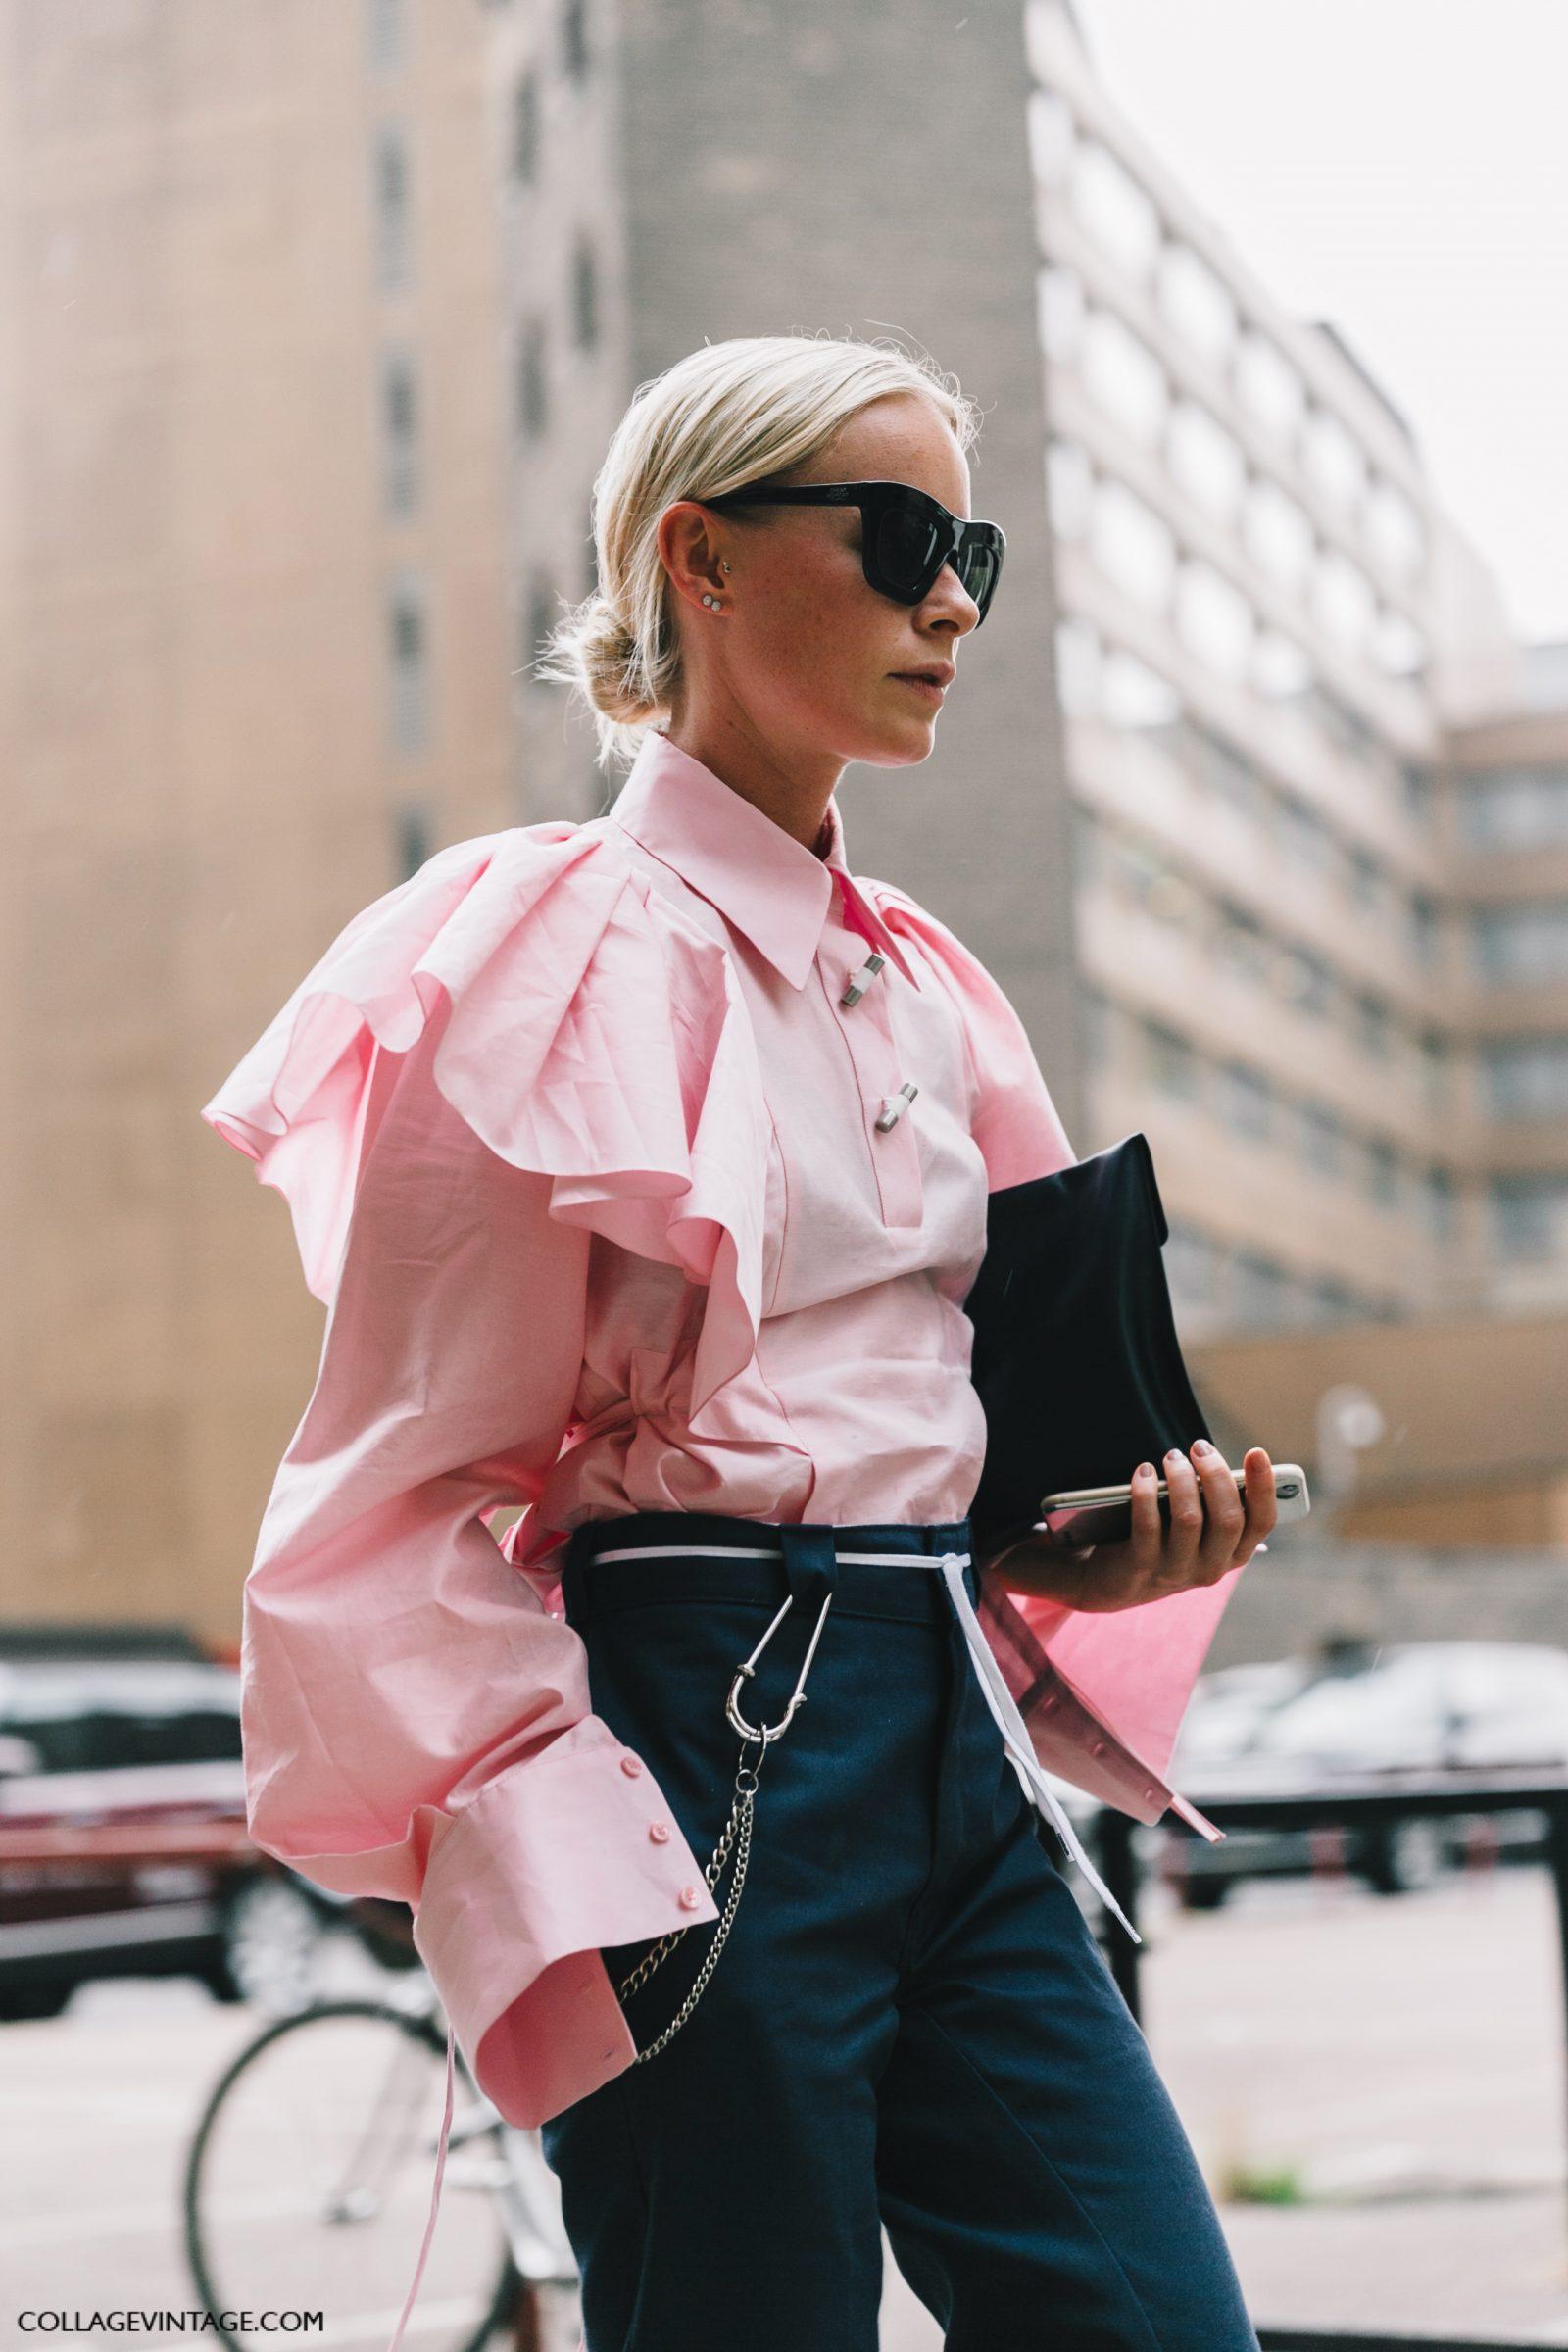 lfw-london_fashion_week_ss17-street_style-outfits-collage_vintage-vintage-roksanda-christopher_kane-joseph-196